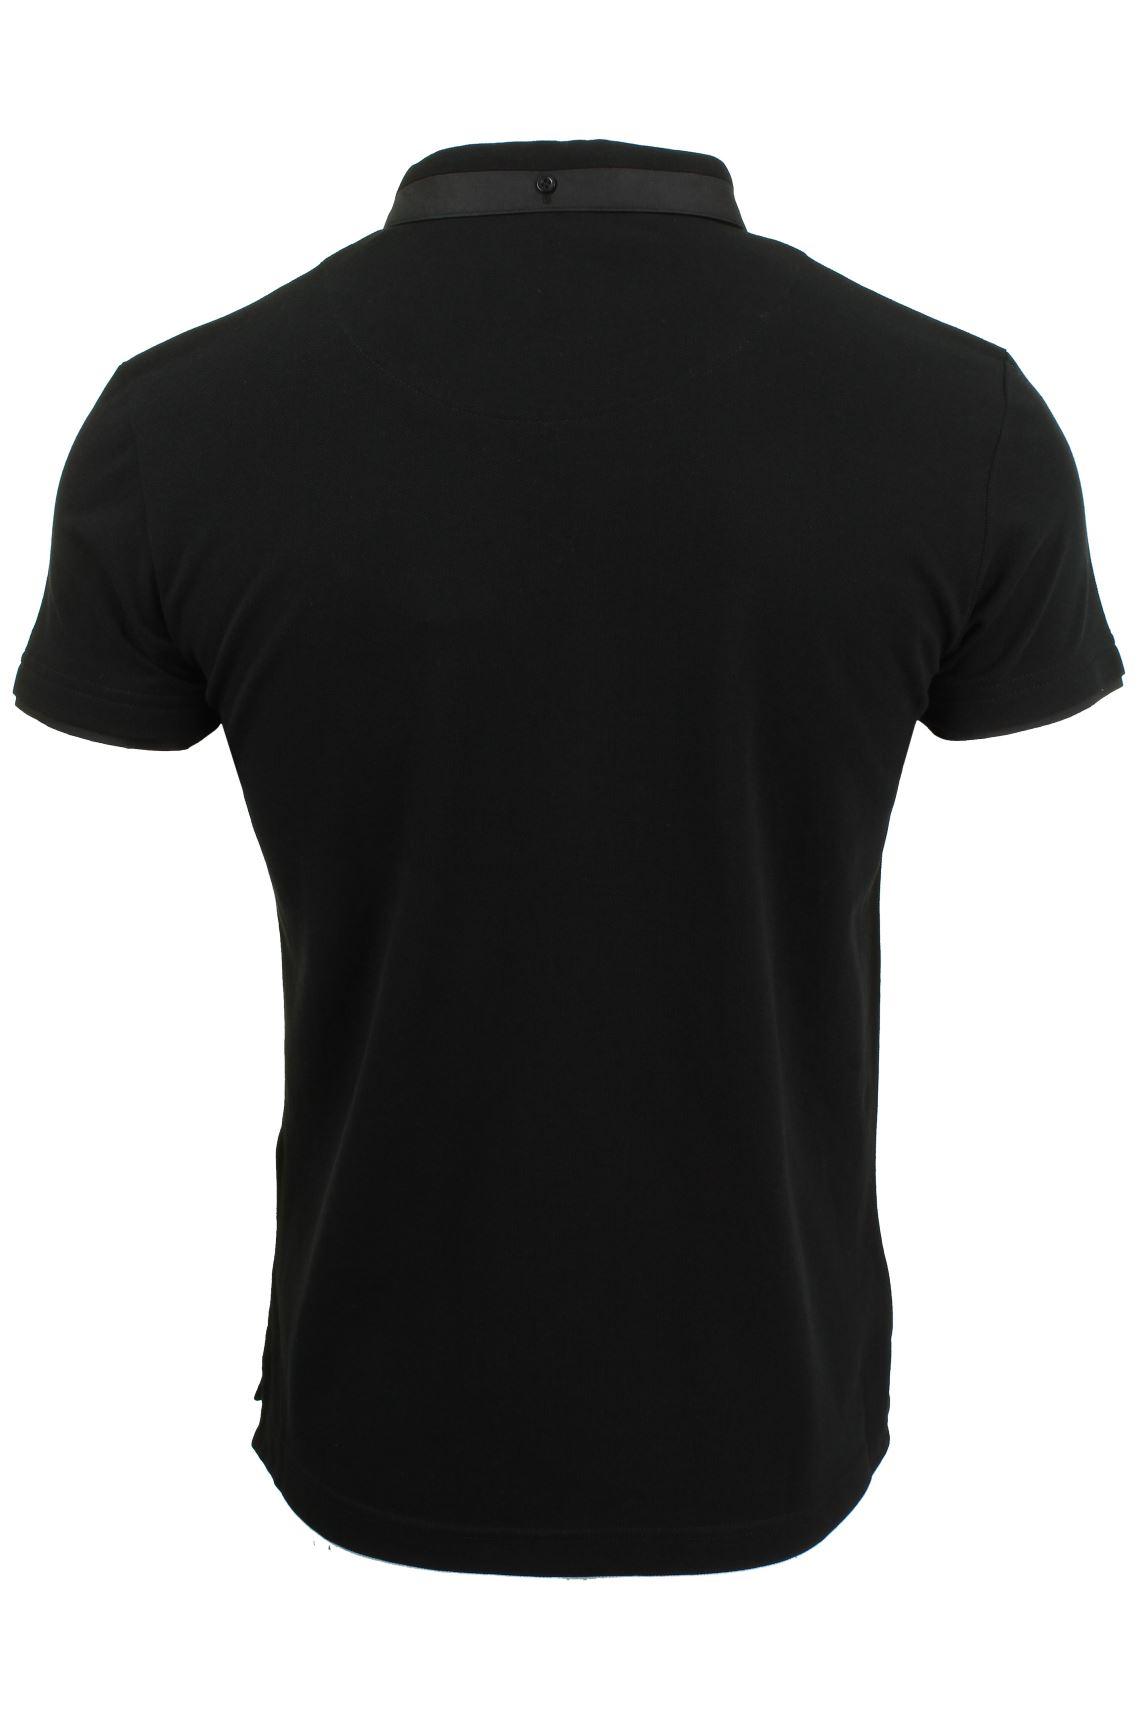 Camisa-Polo-para-hombre-Manga-corta-desde-el-apagon-Collection-by-Voi-Jeans miniatura 19